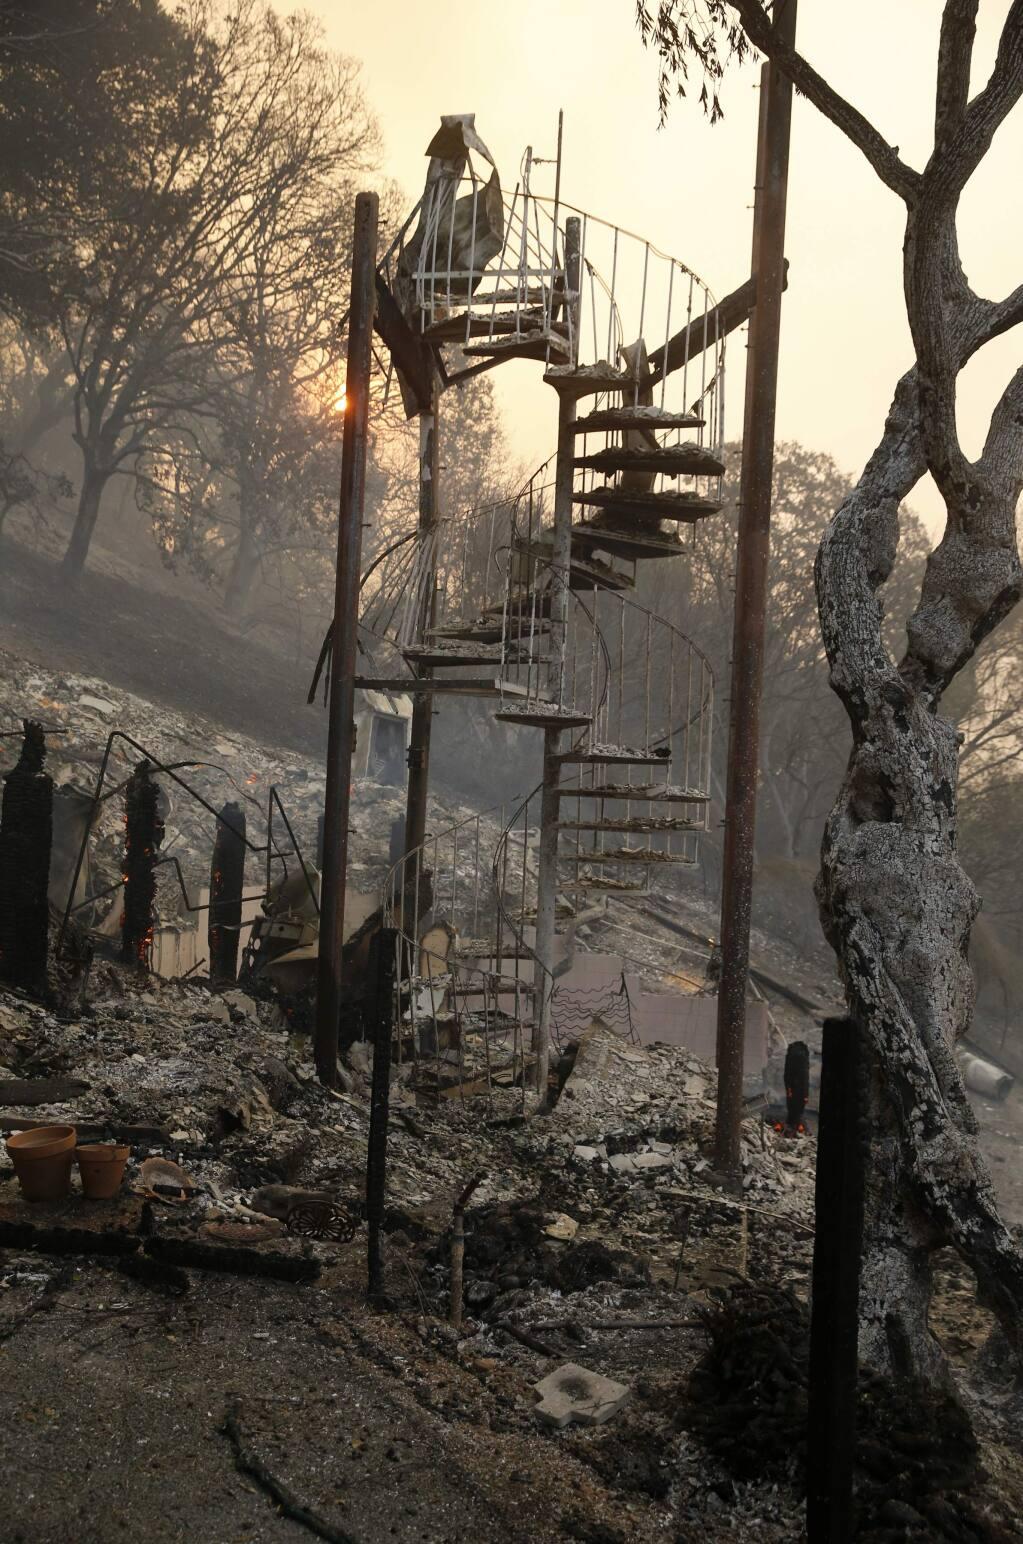 A staircase left among burned debris at the Olea Hotel on Monday, October 9, 2017 in Glen Ellen, California . (BETH SCHLANKER/The Press Democrat)